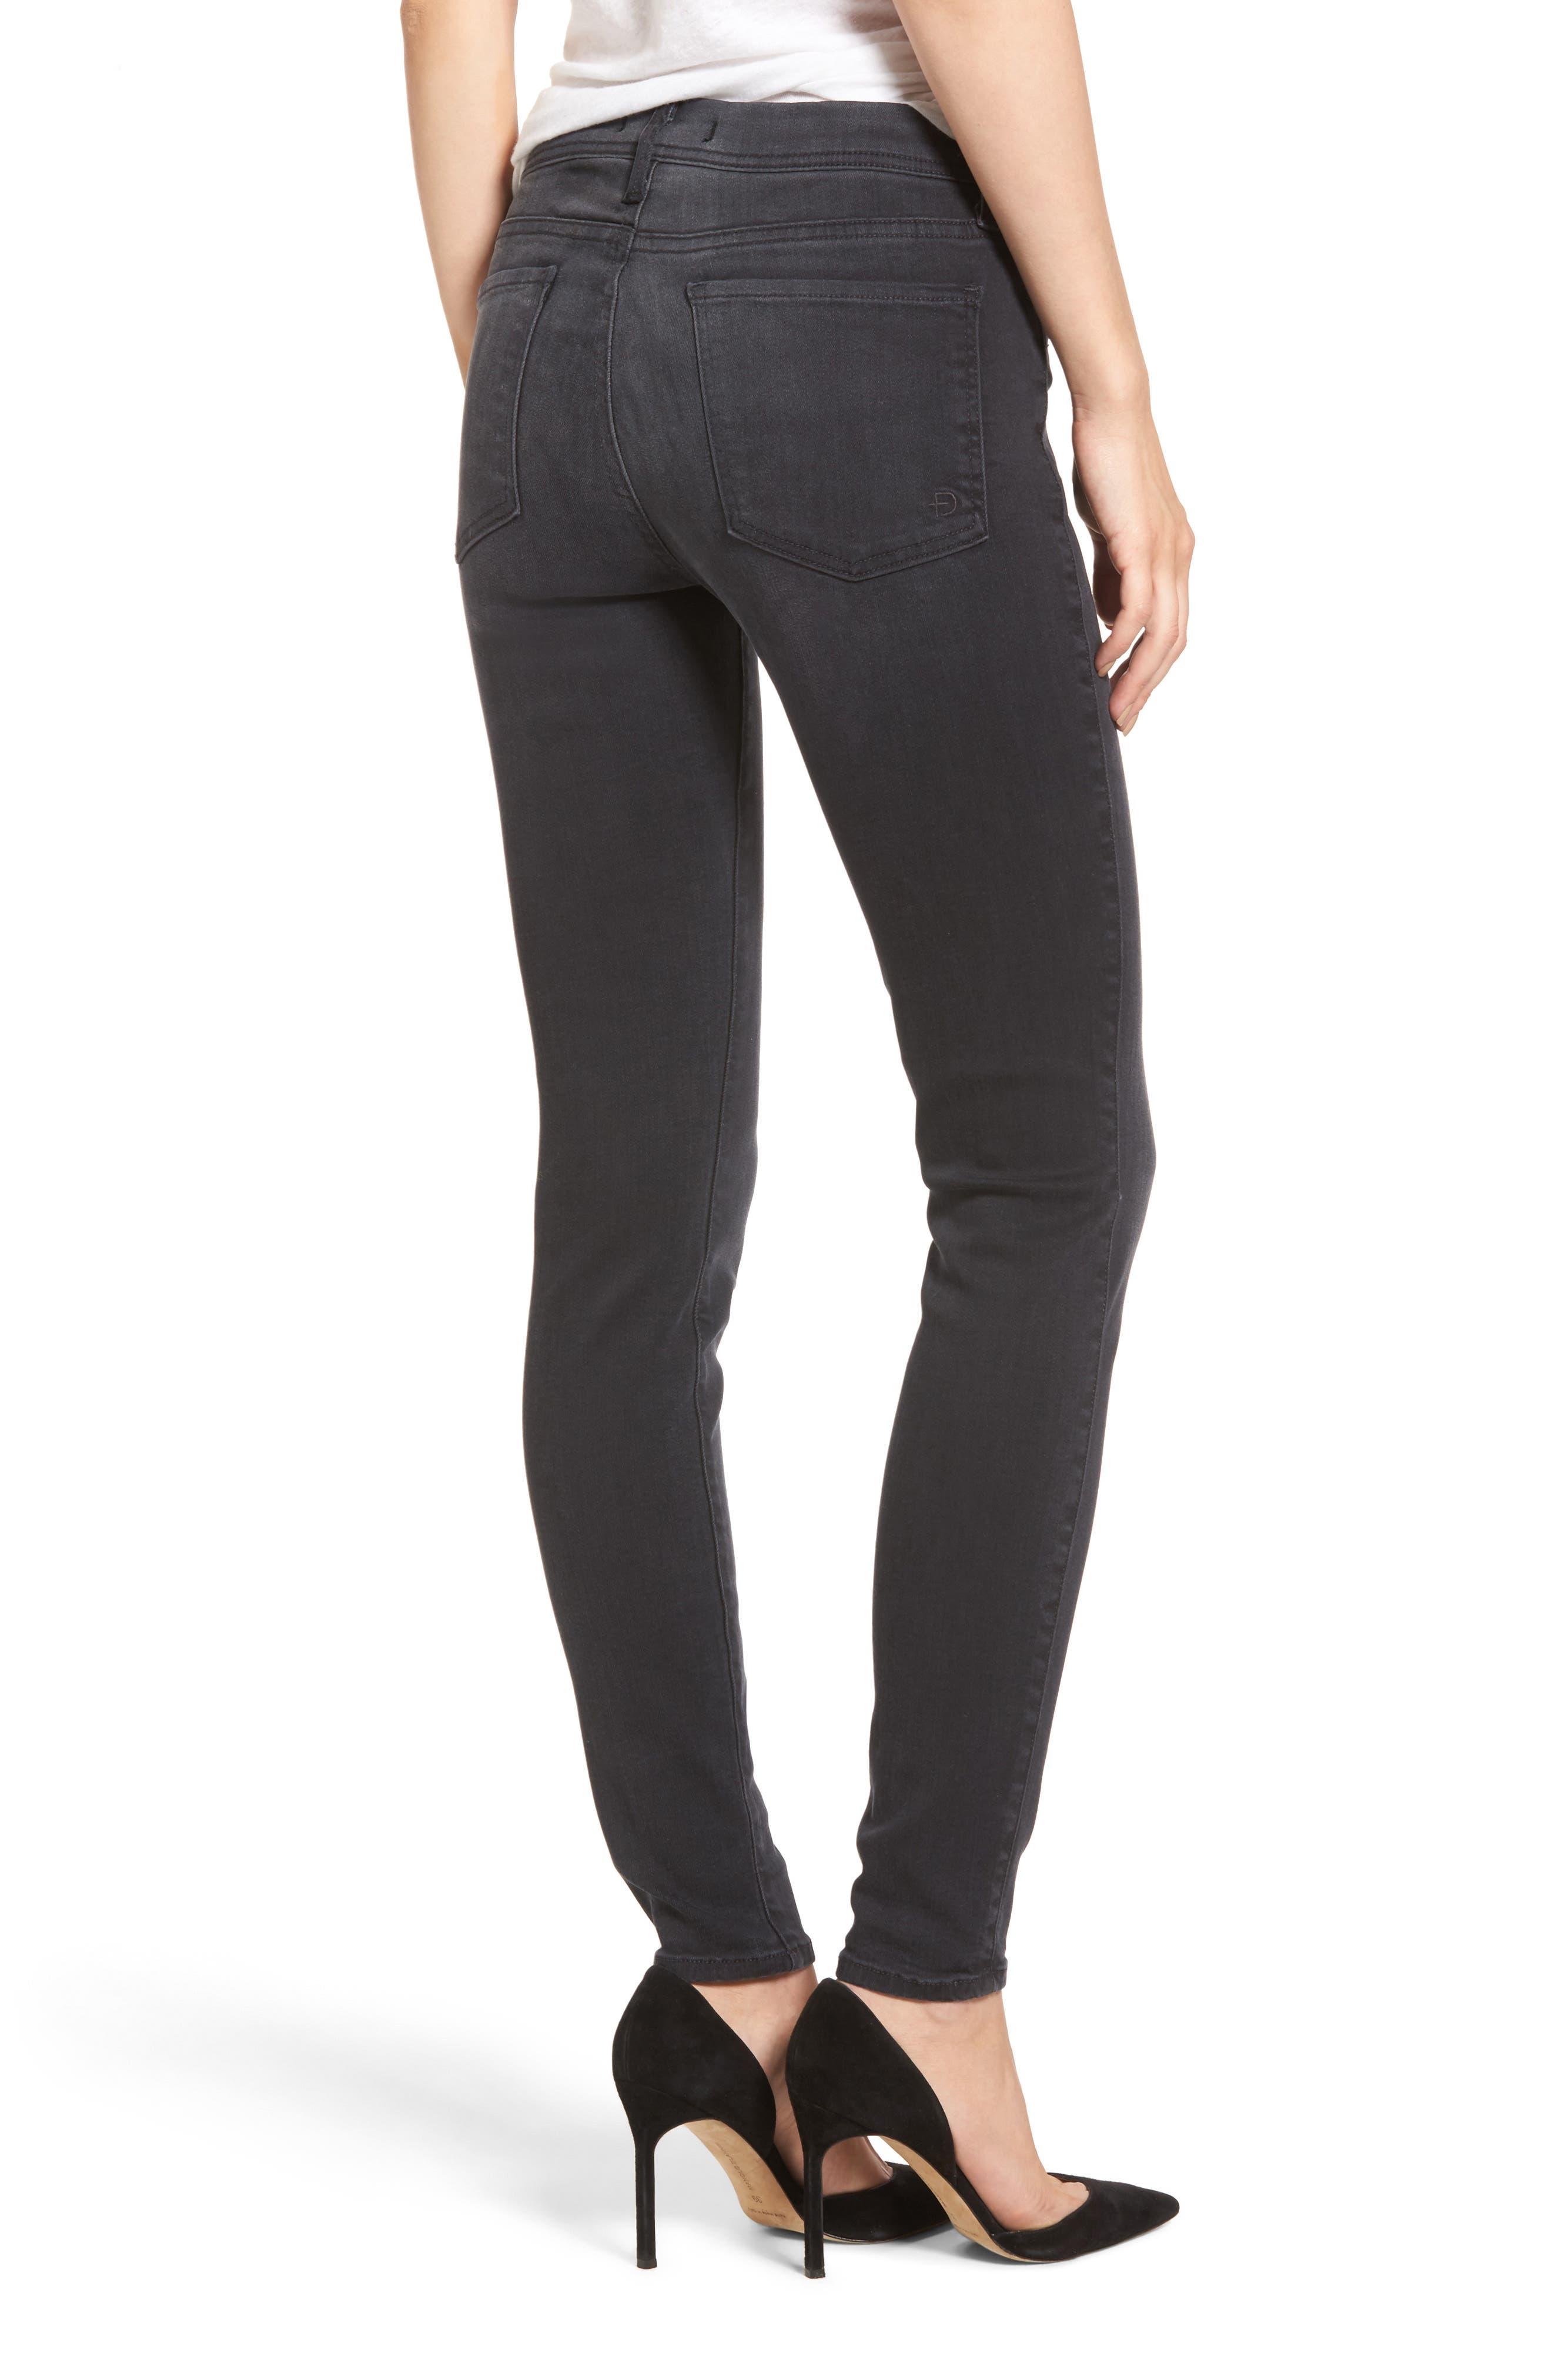 Belvedere Skinny Jeans,                             Alternate thumbnail 2, color,                             001